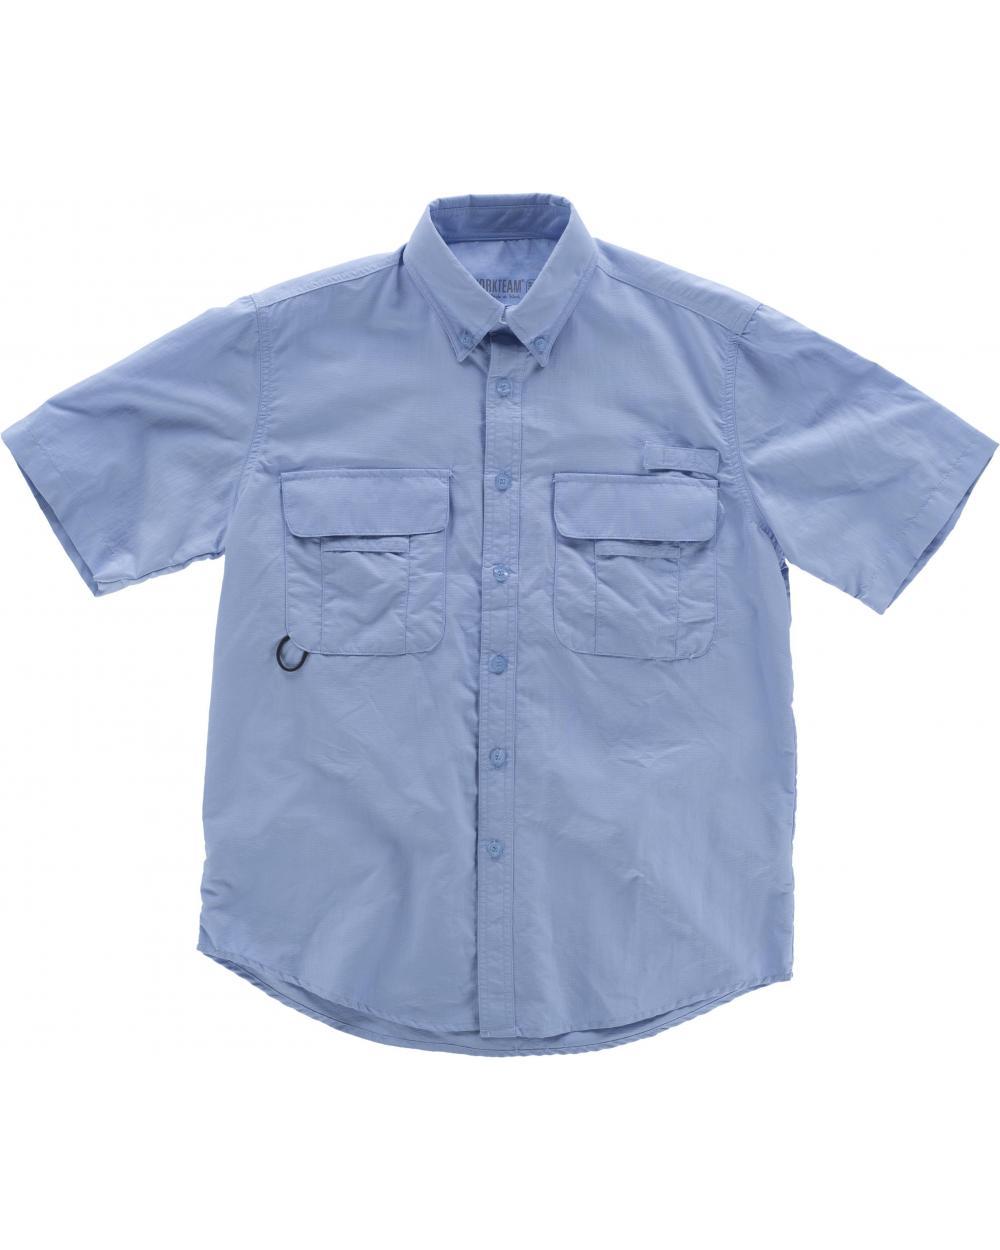 Comprar Camisa de nylon manga corta B8500 Celeste workteam lado